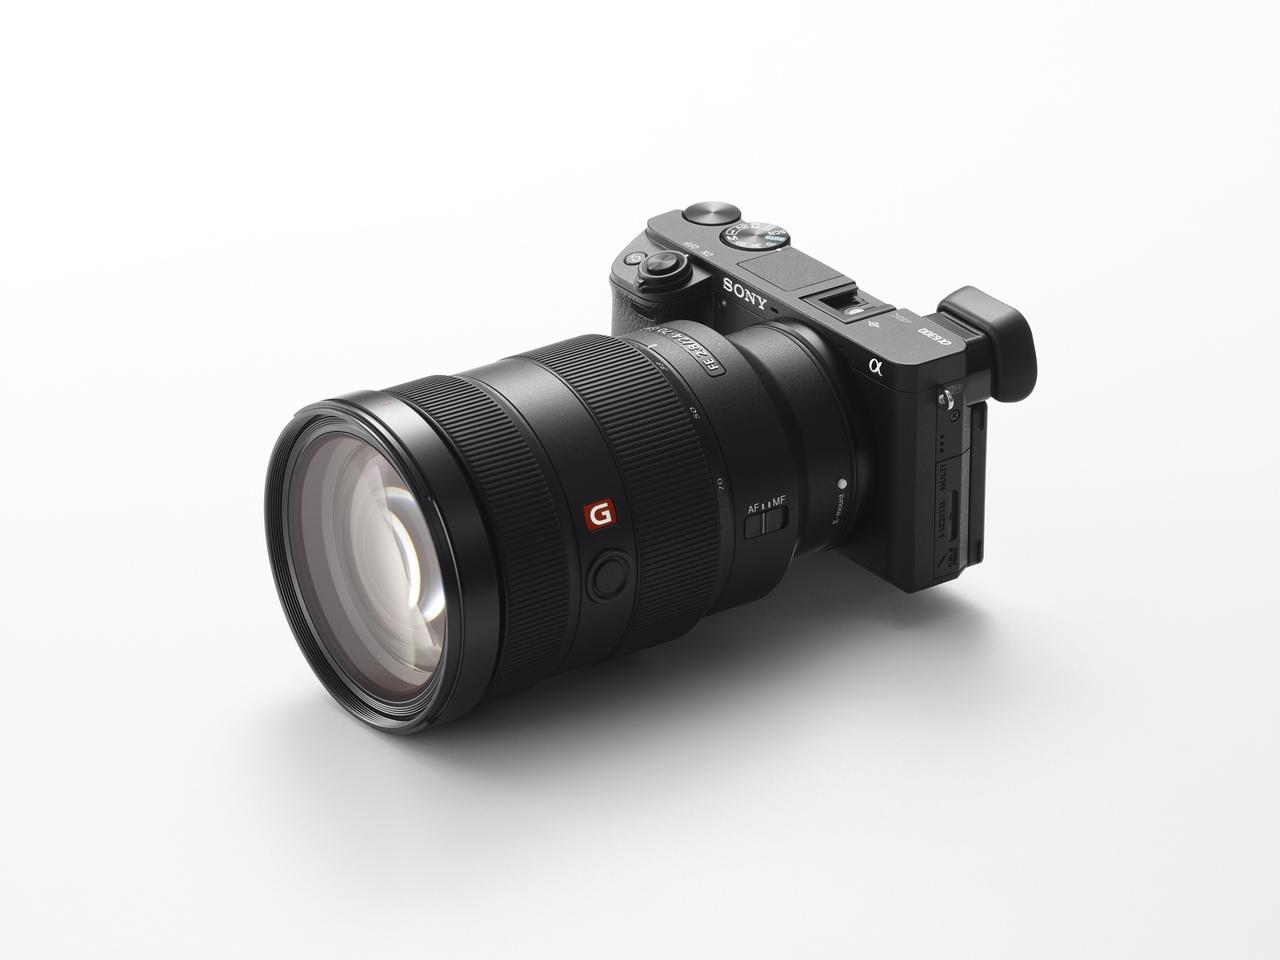 Sony Alpha ILCE-6300